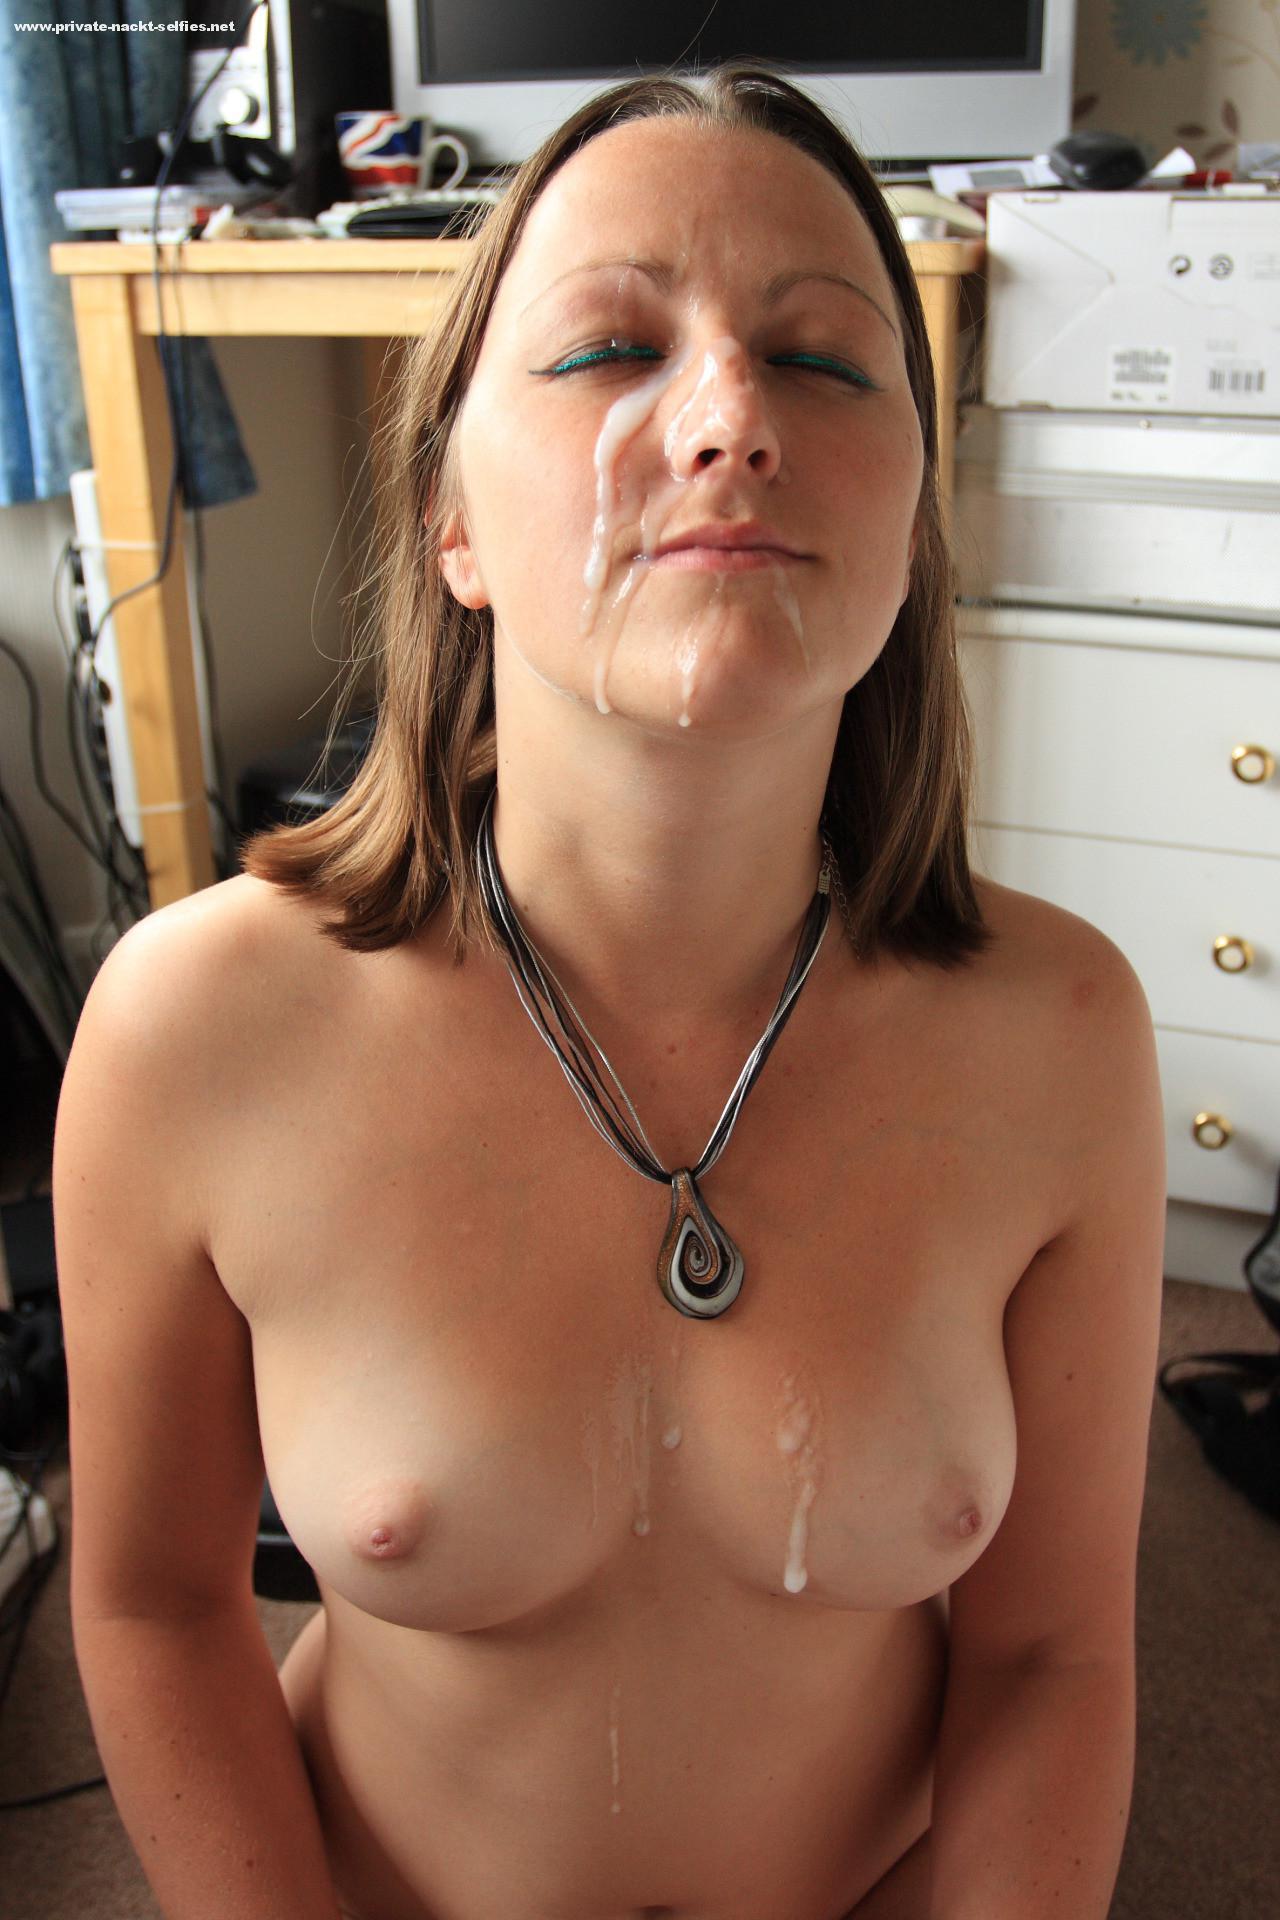 Shemale mia isabella nude